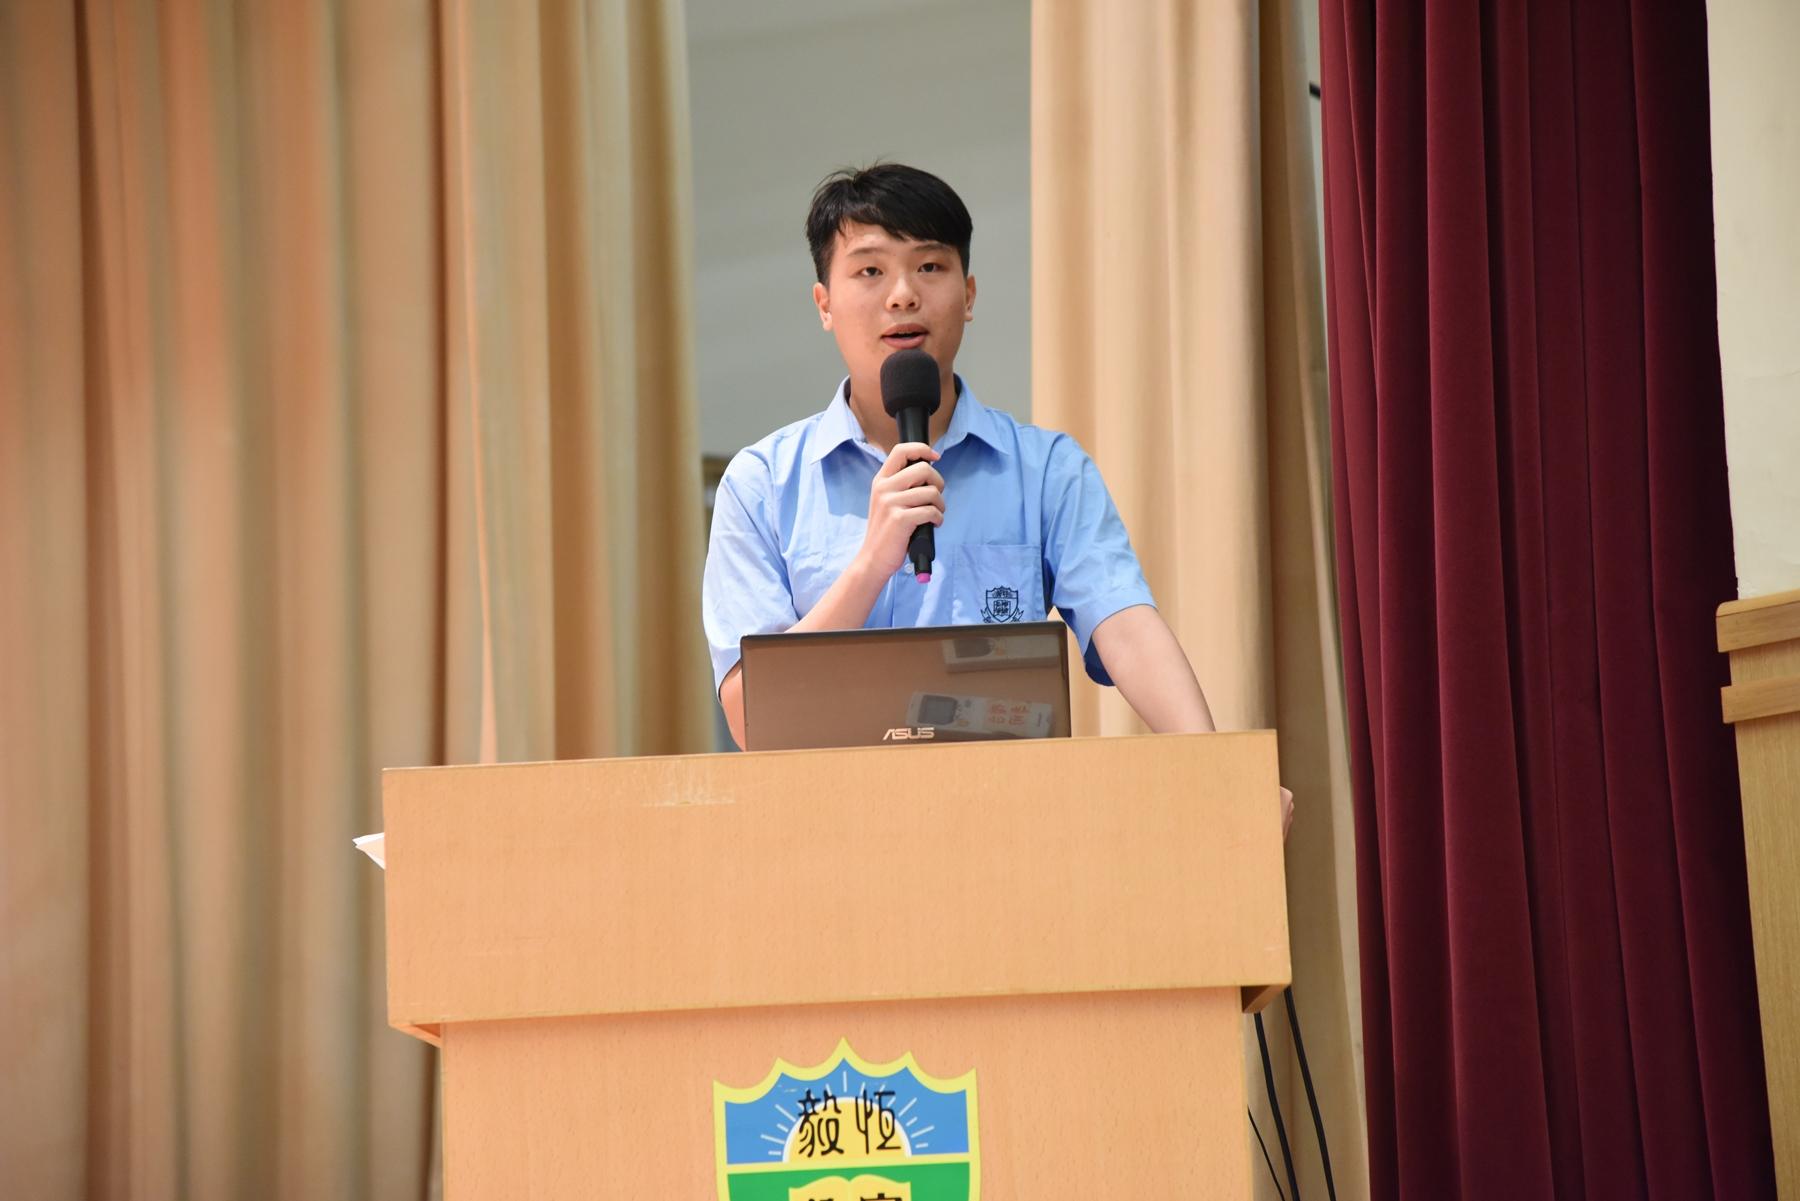 http://www.npc.edu.hk/sites/default/files/dsc_1248.jpg